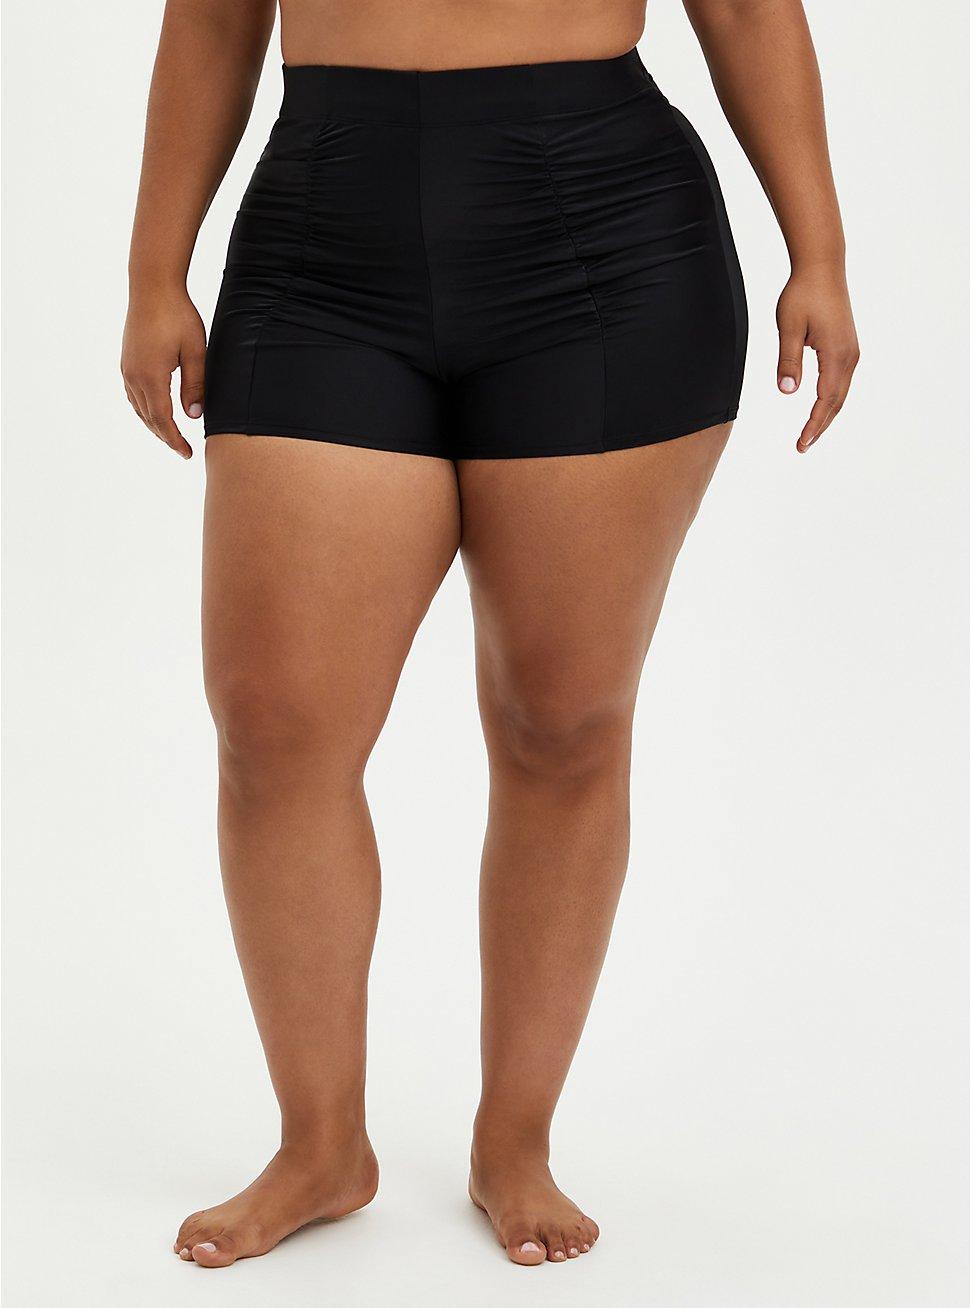 Ultra High Ruched Swim Short - Black, DEEP BLACK, hi-res